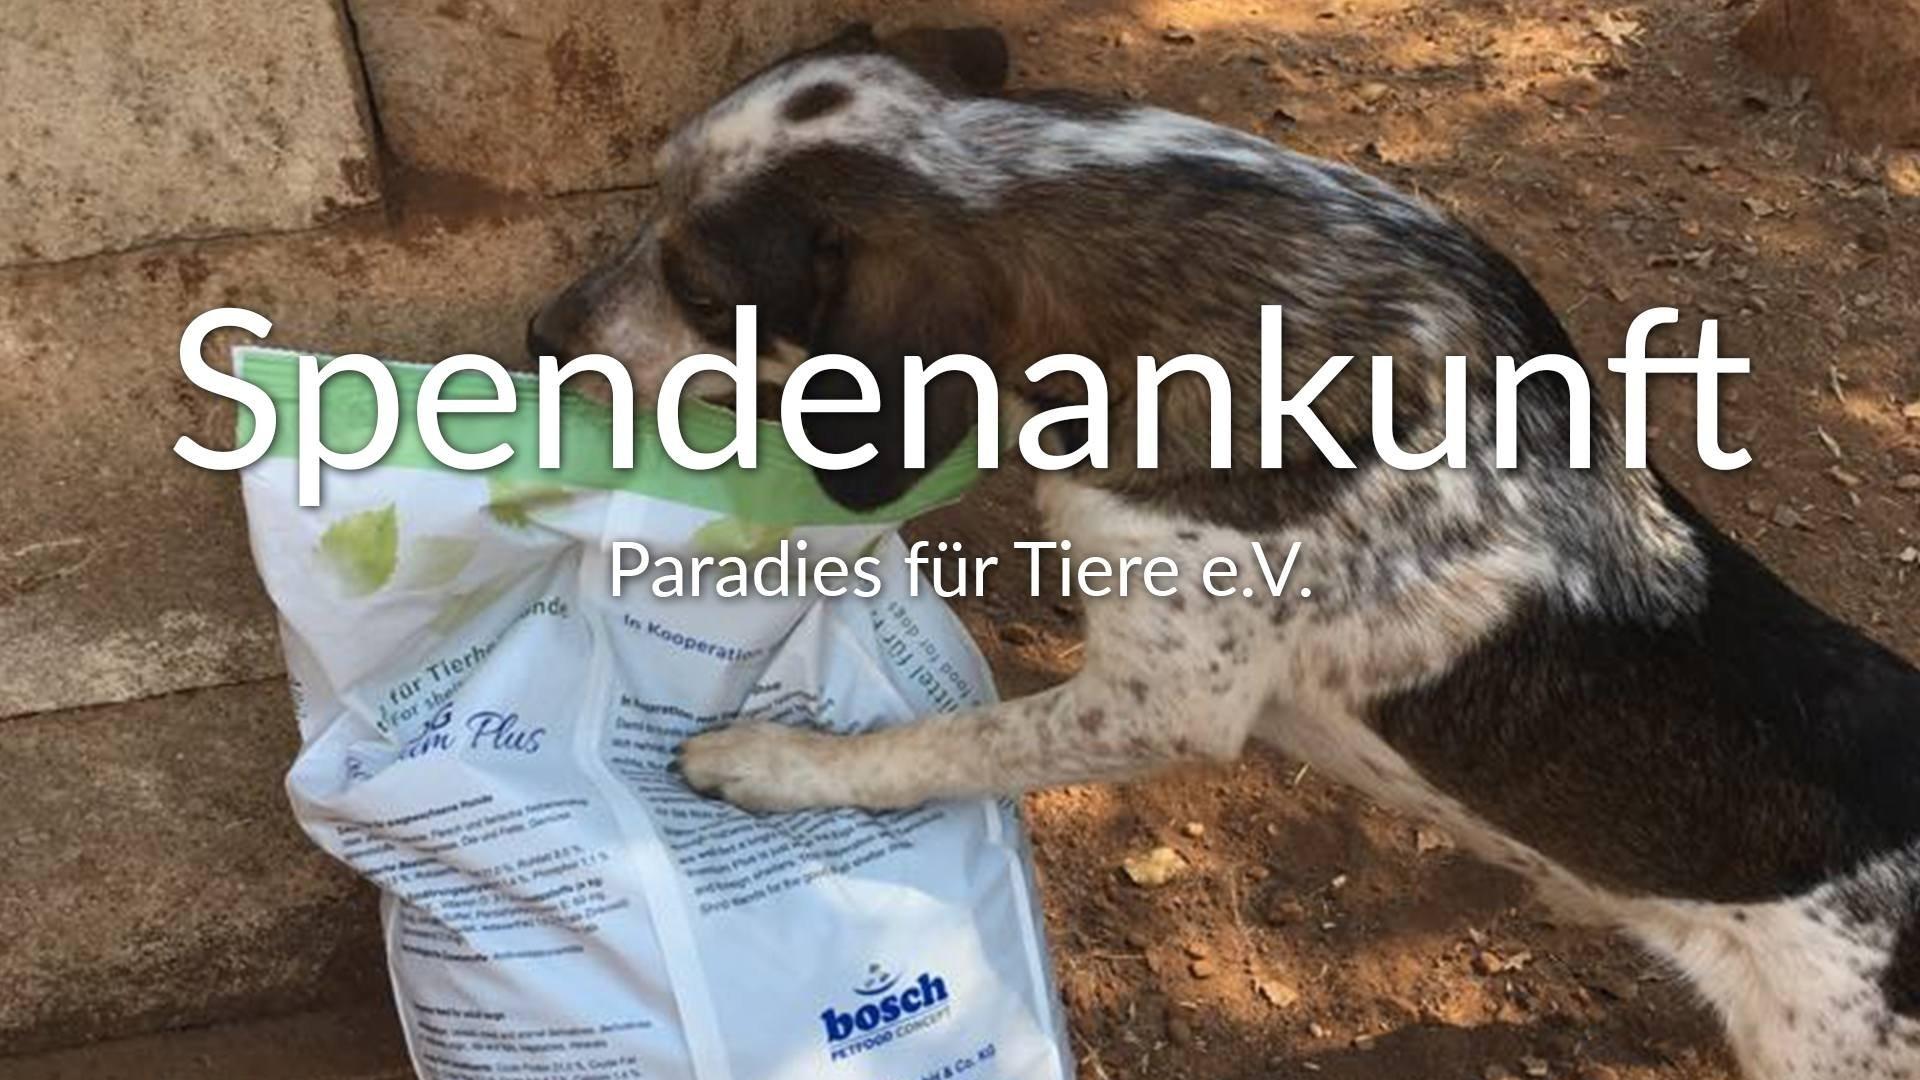 Paradies für Tiere e.V.-Futterspendenankunft-september 2019-Spendenaktion-Sommerloch-Italien VIDEO-1